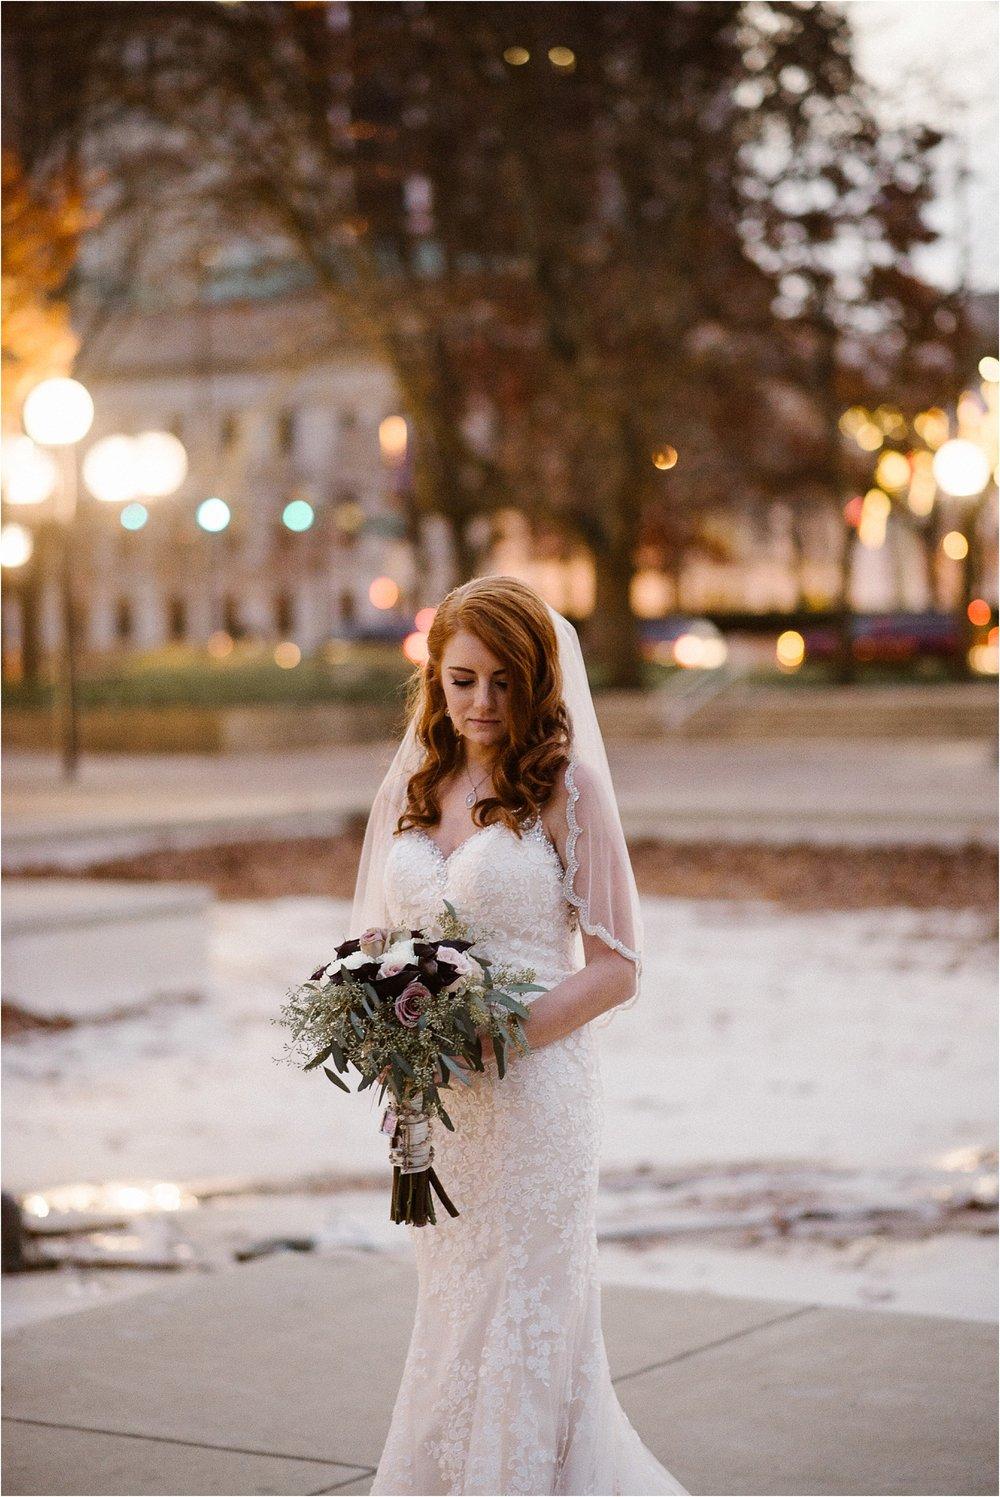 elegant-wedding-empyrean-events-catering-fort-wayne-indiana-photographer-59